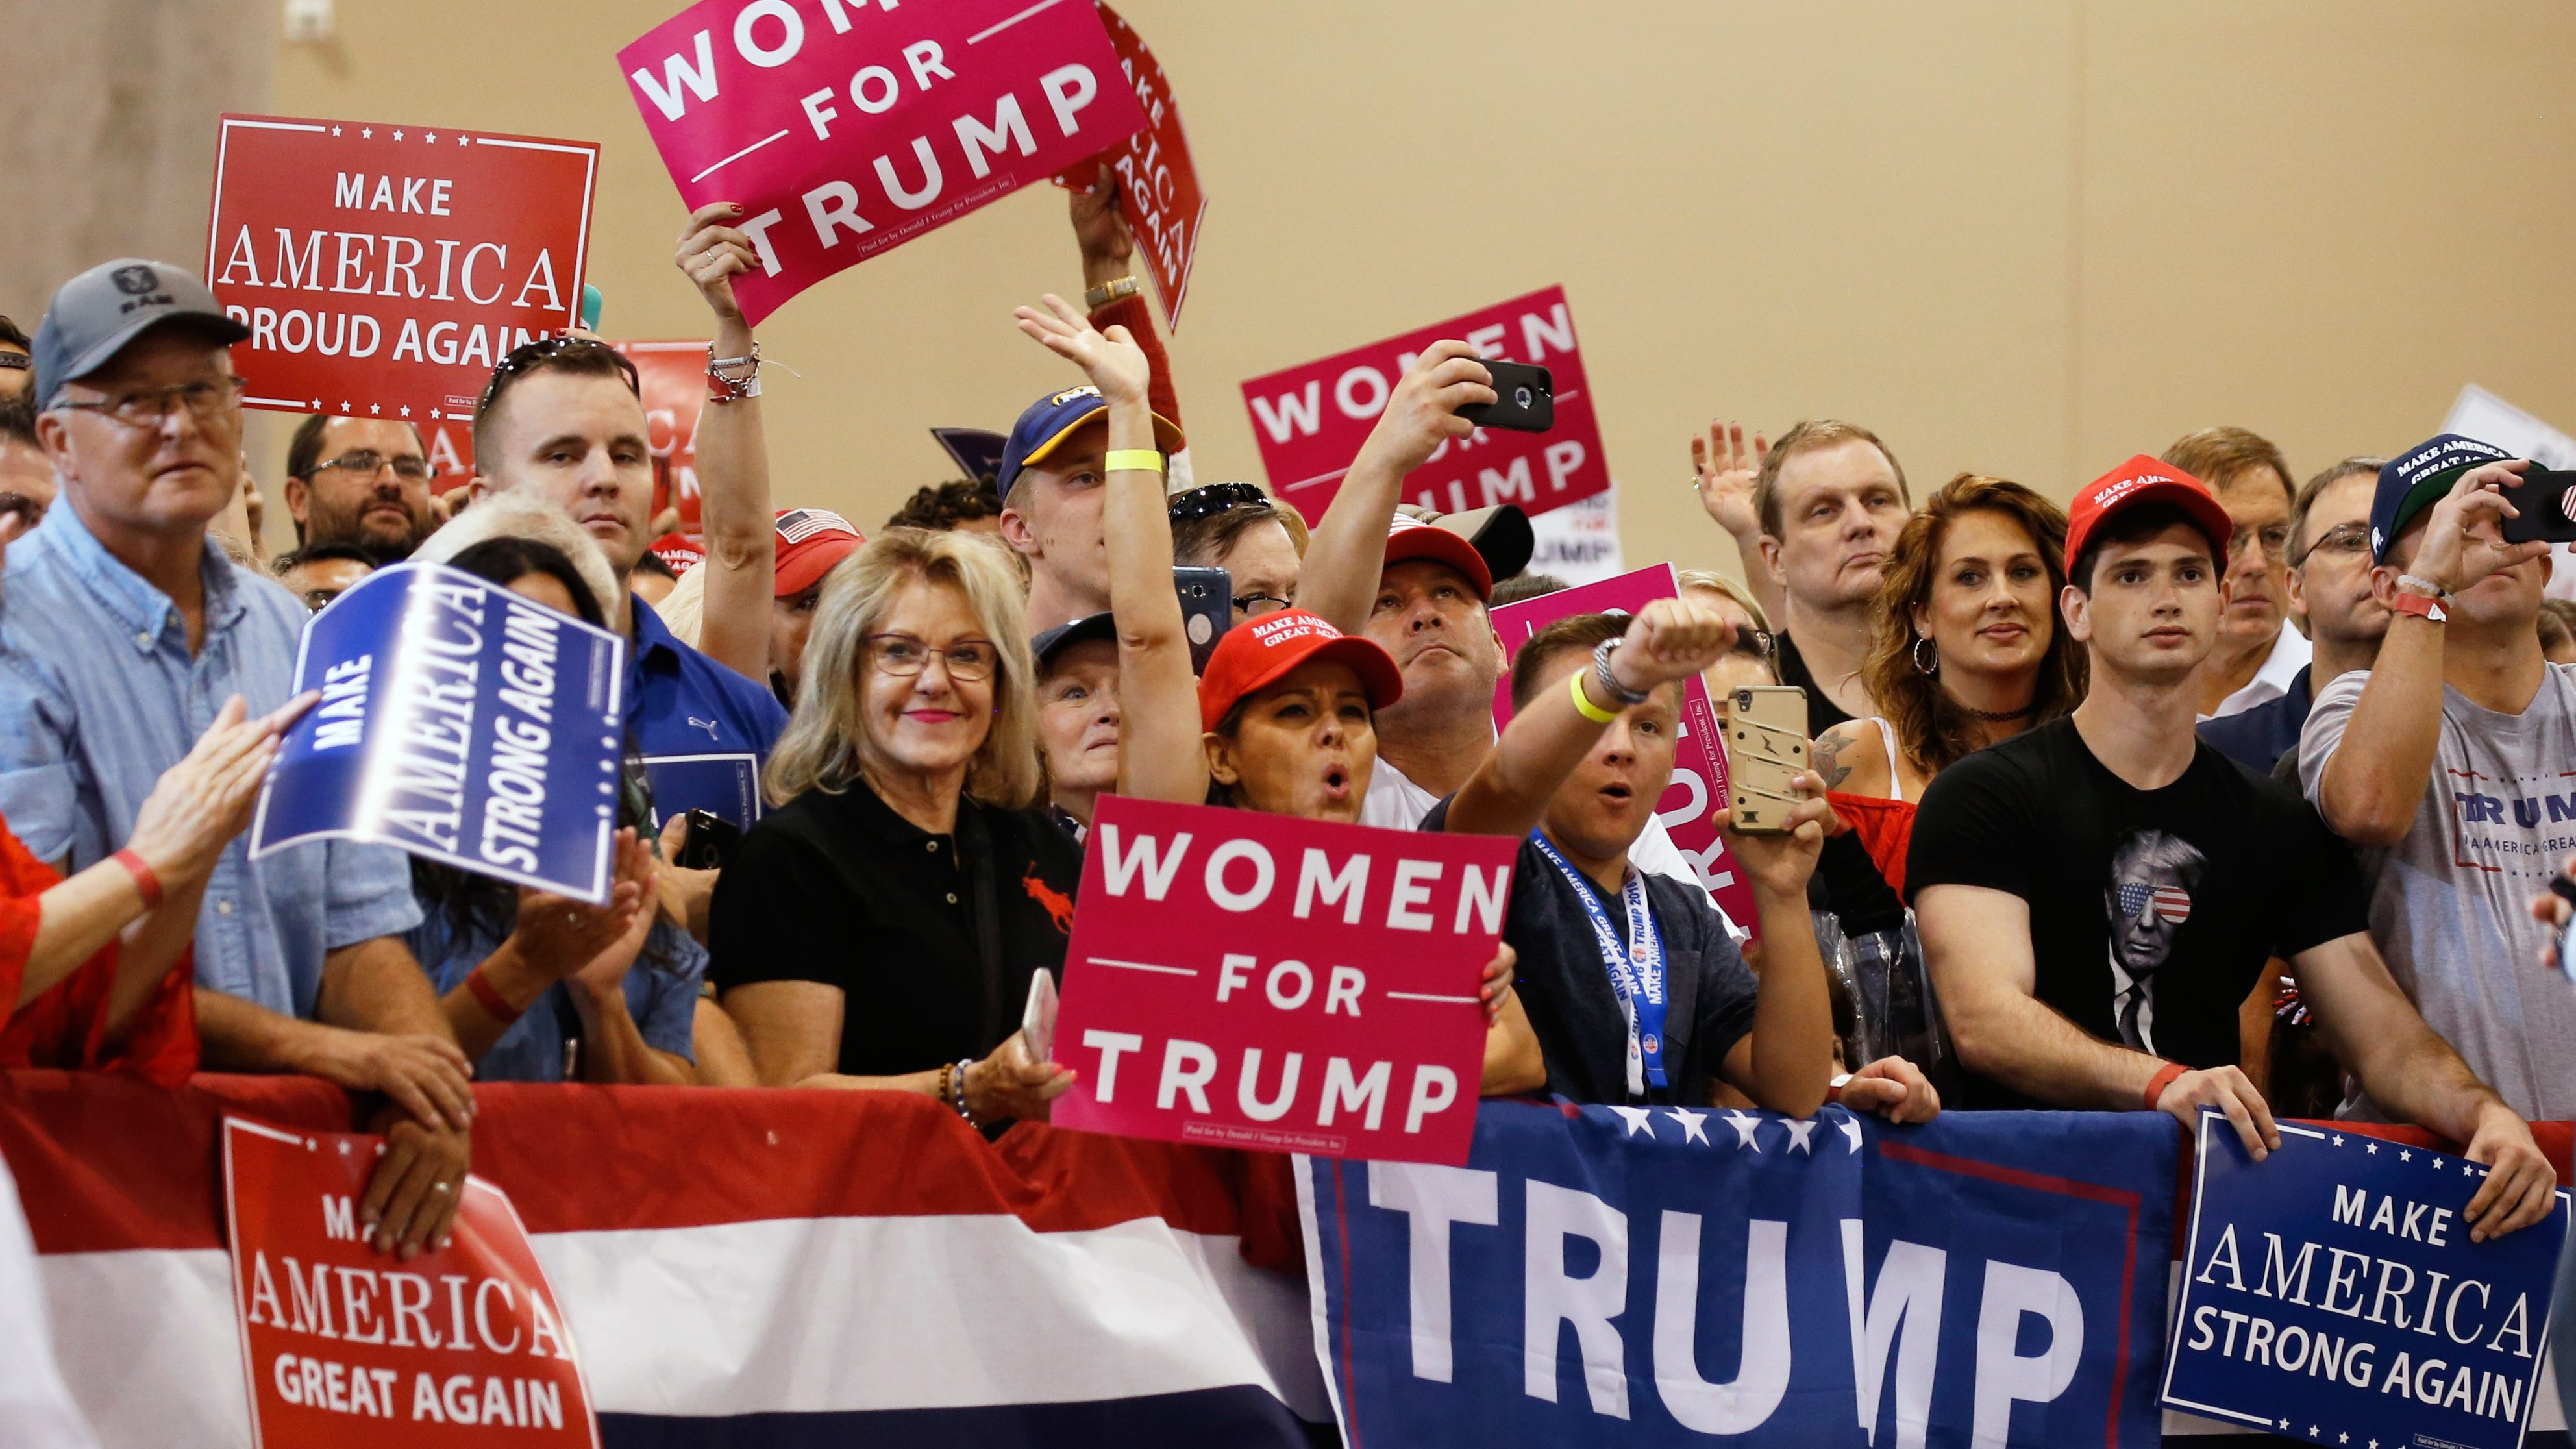 Trump supporters await Donald Trump